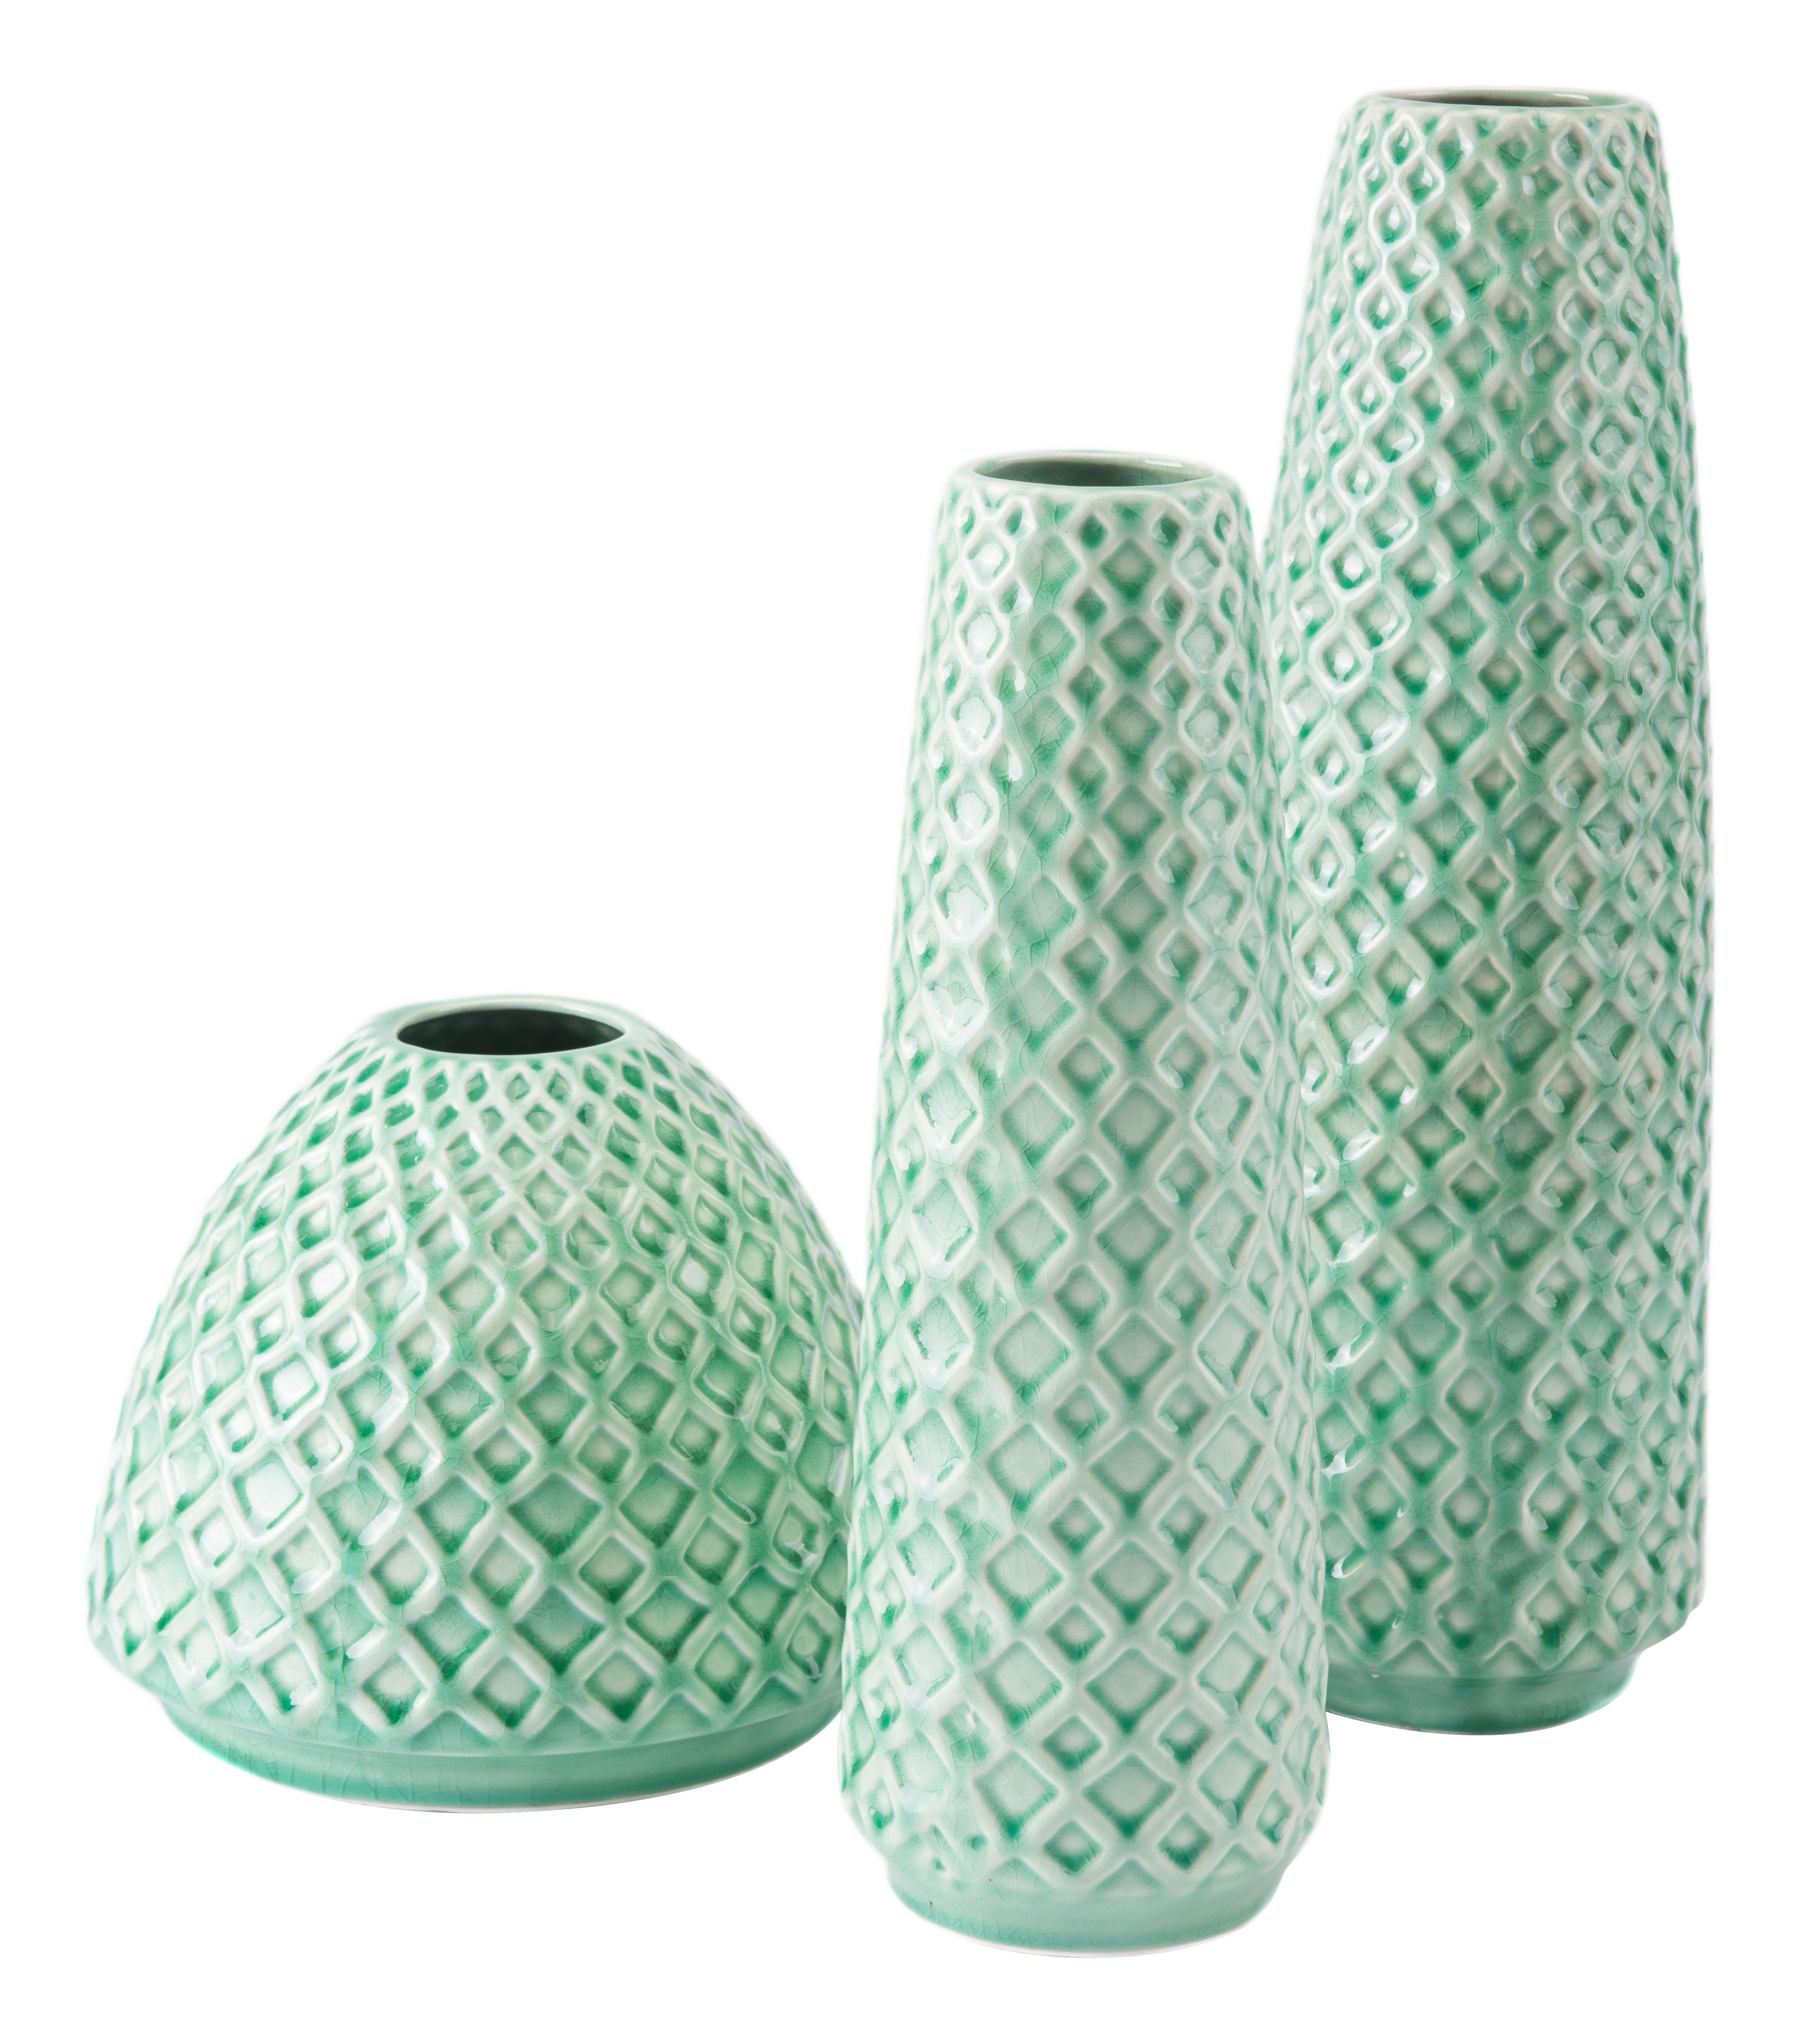 Zuo Rombo vases